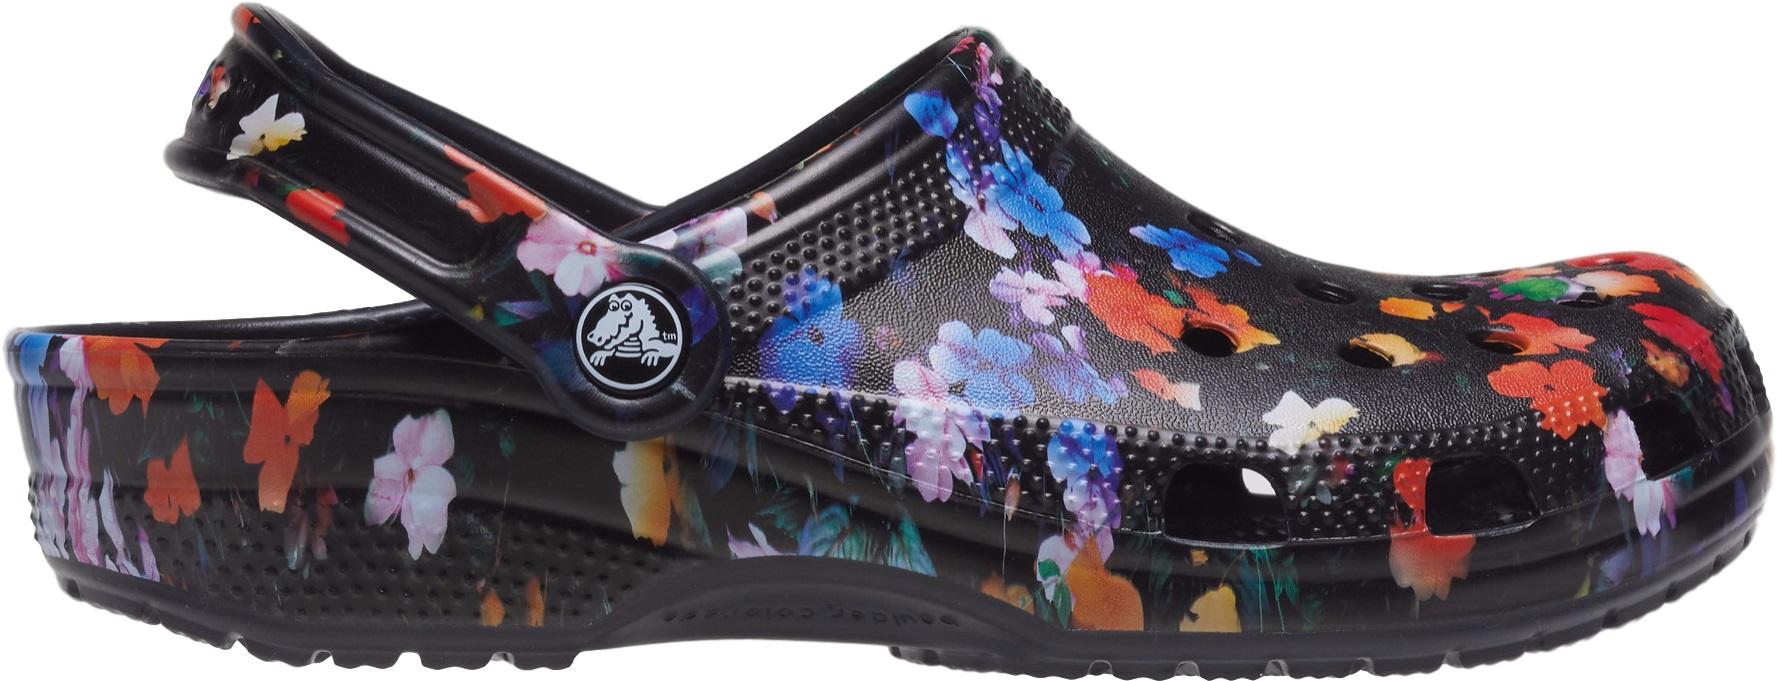 Crocs™ Classic Printed Floral Clog Black/Multi 42,5